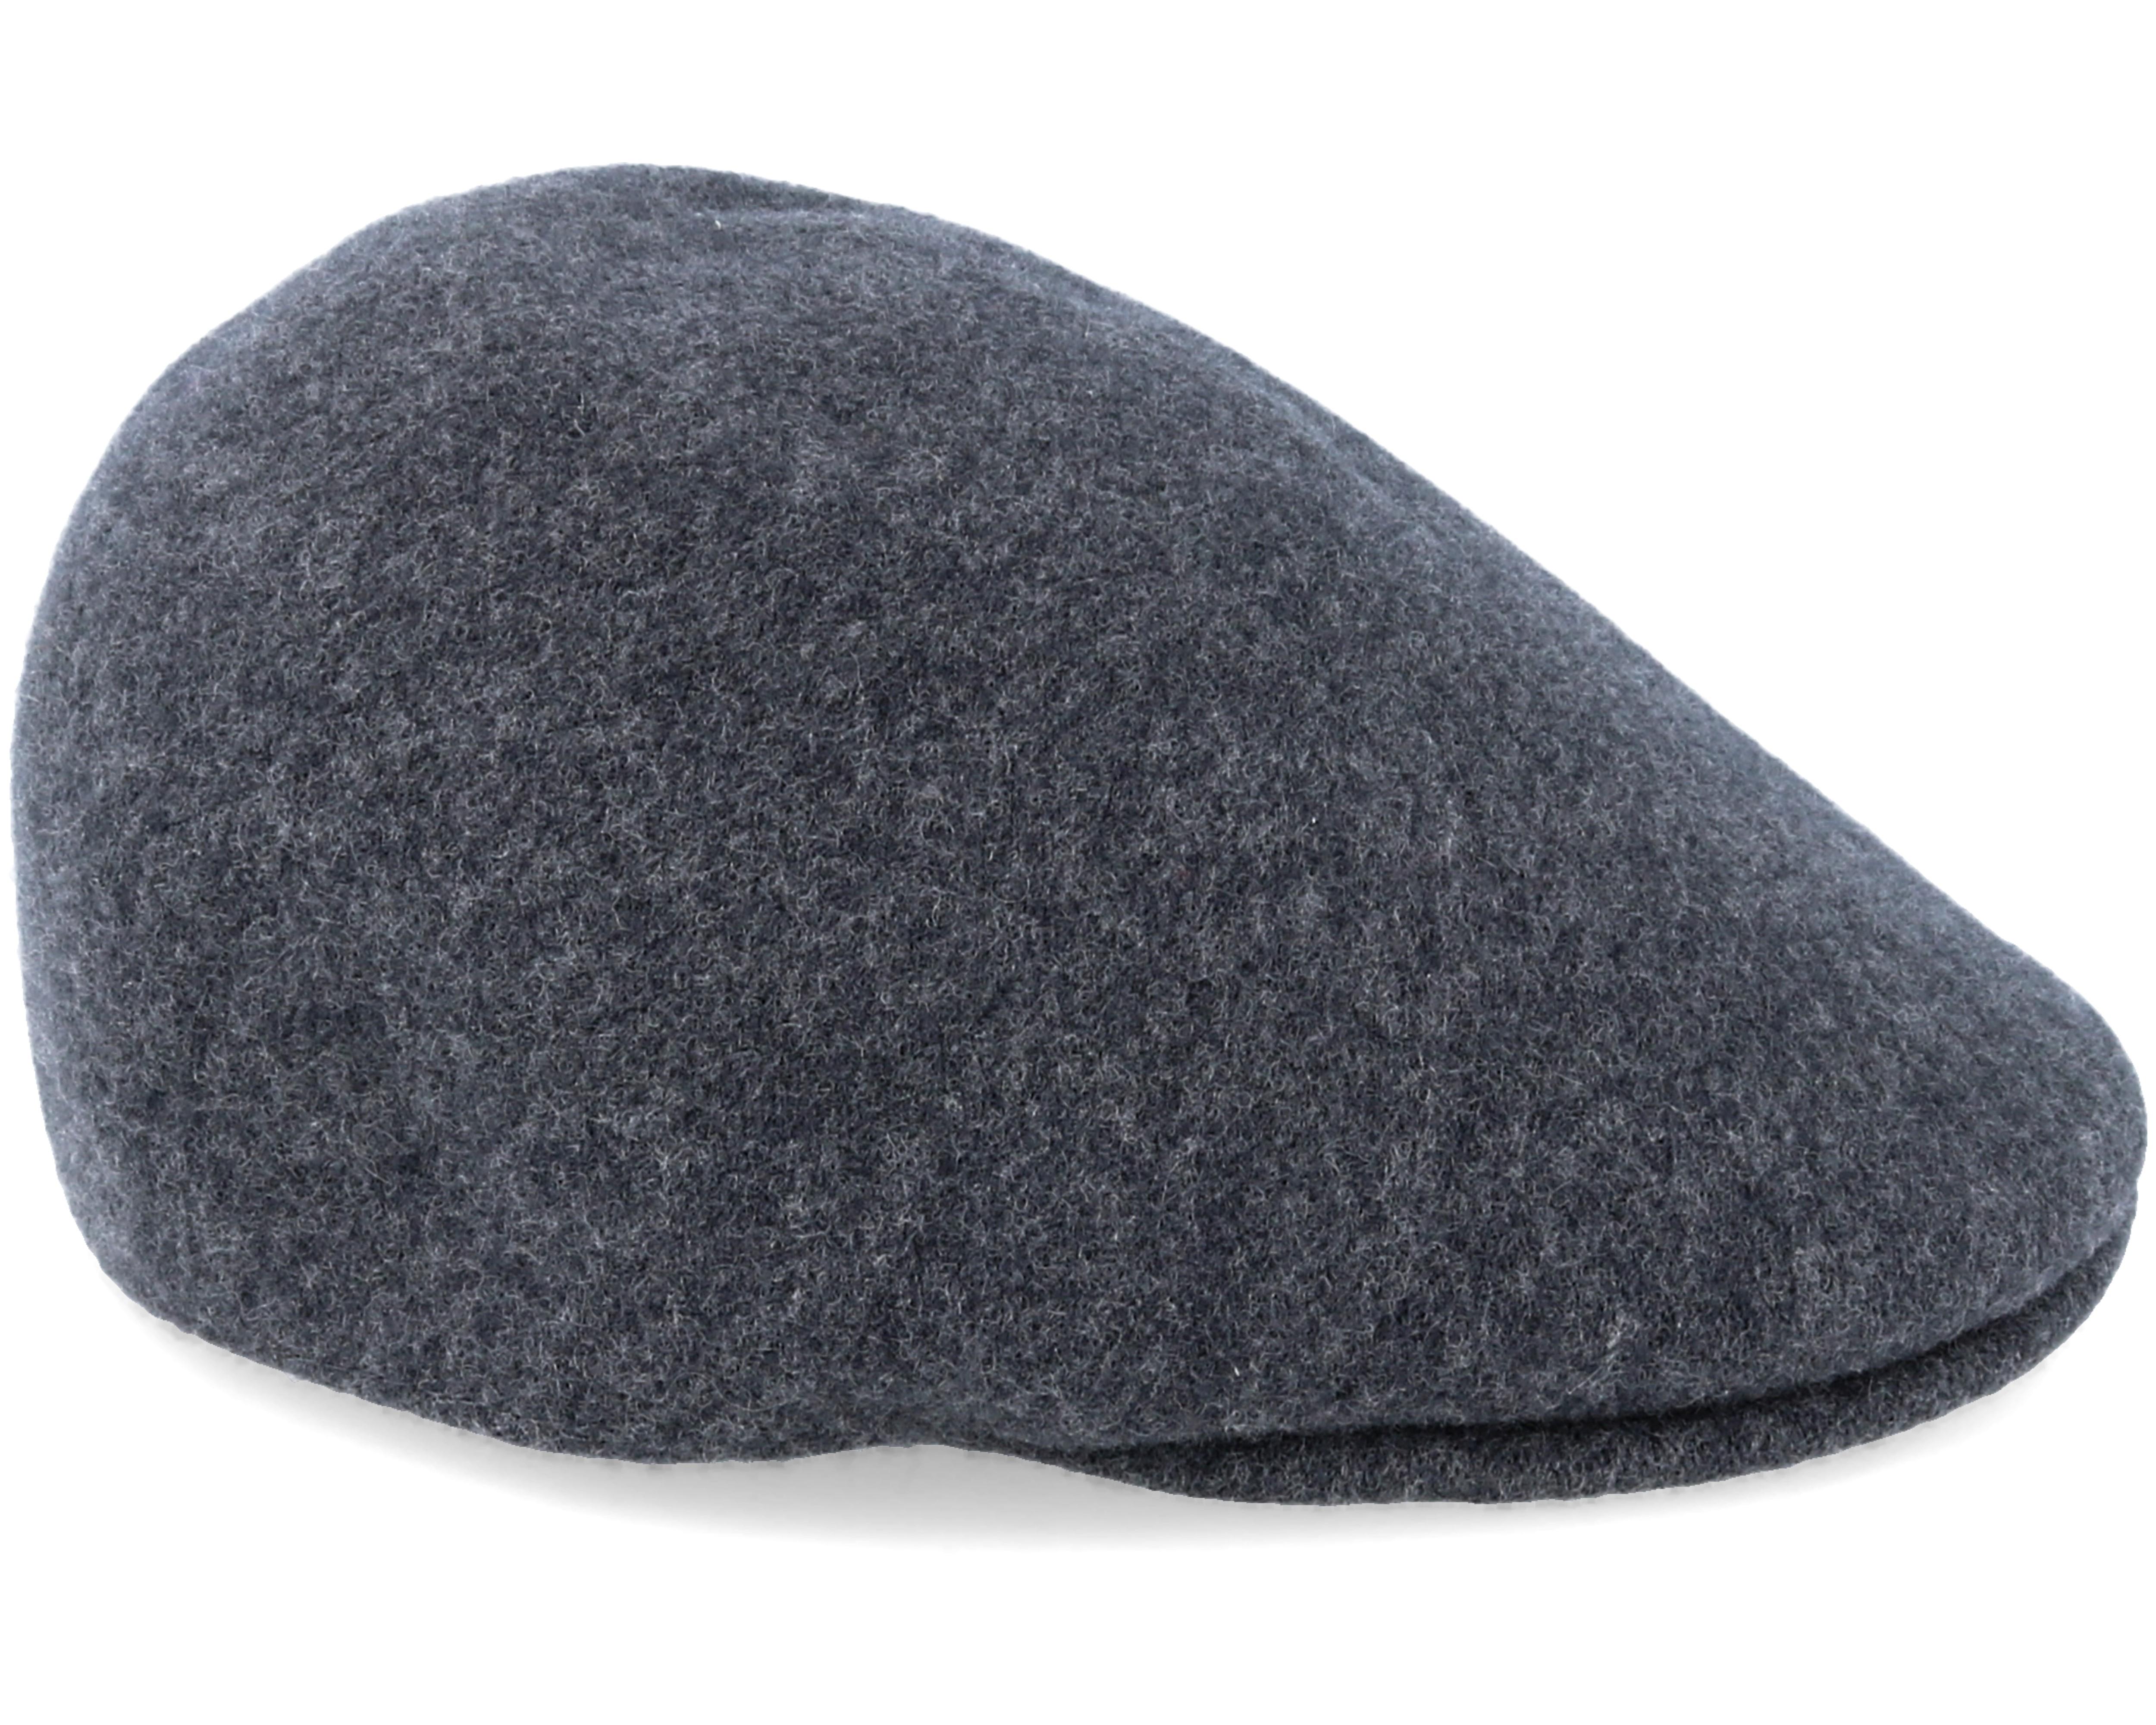 Seamless Wool Flanell Grey Flat Cap Kangol Caps